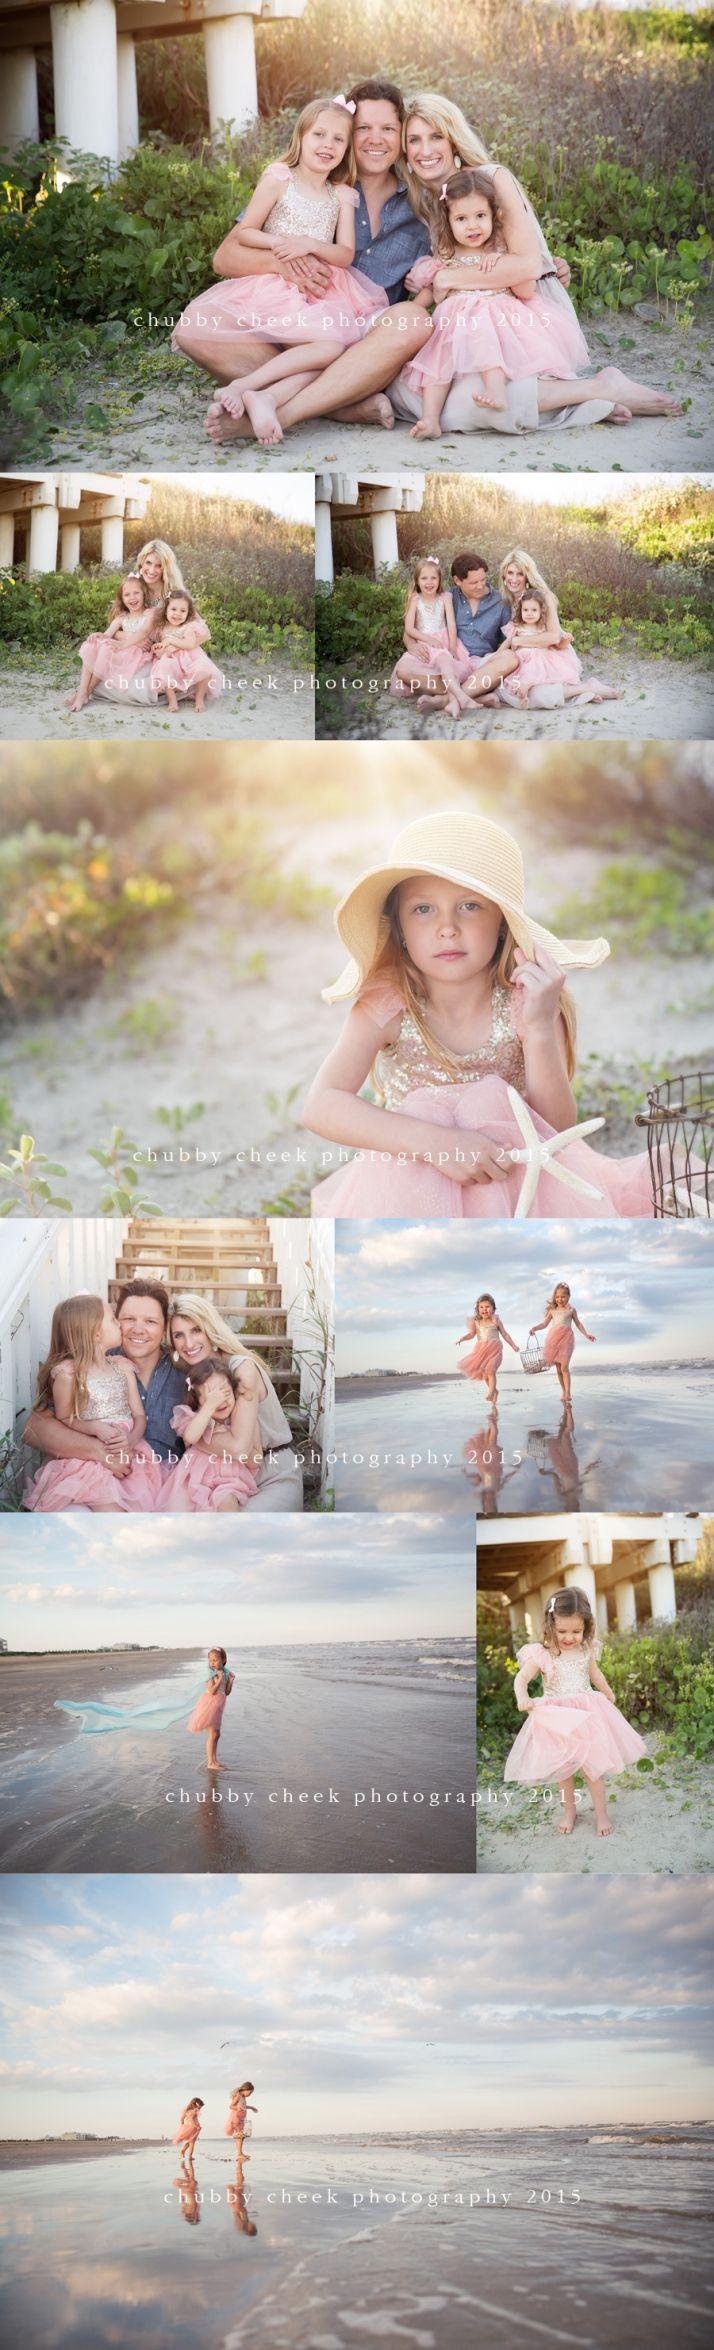 chubby cheek photography galveston tx family photographer